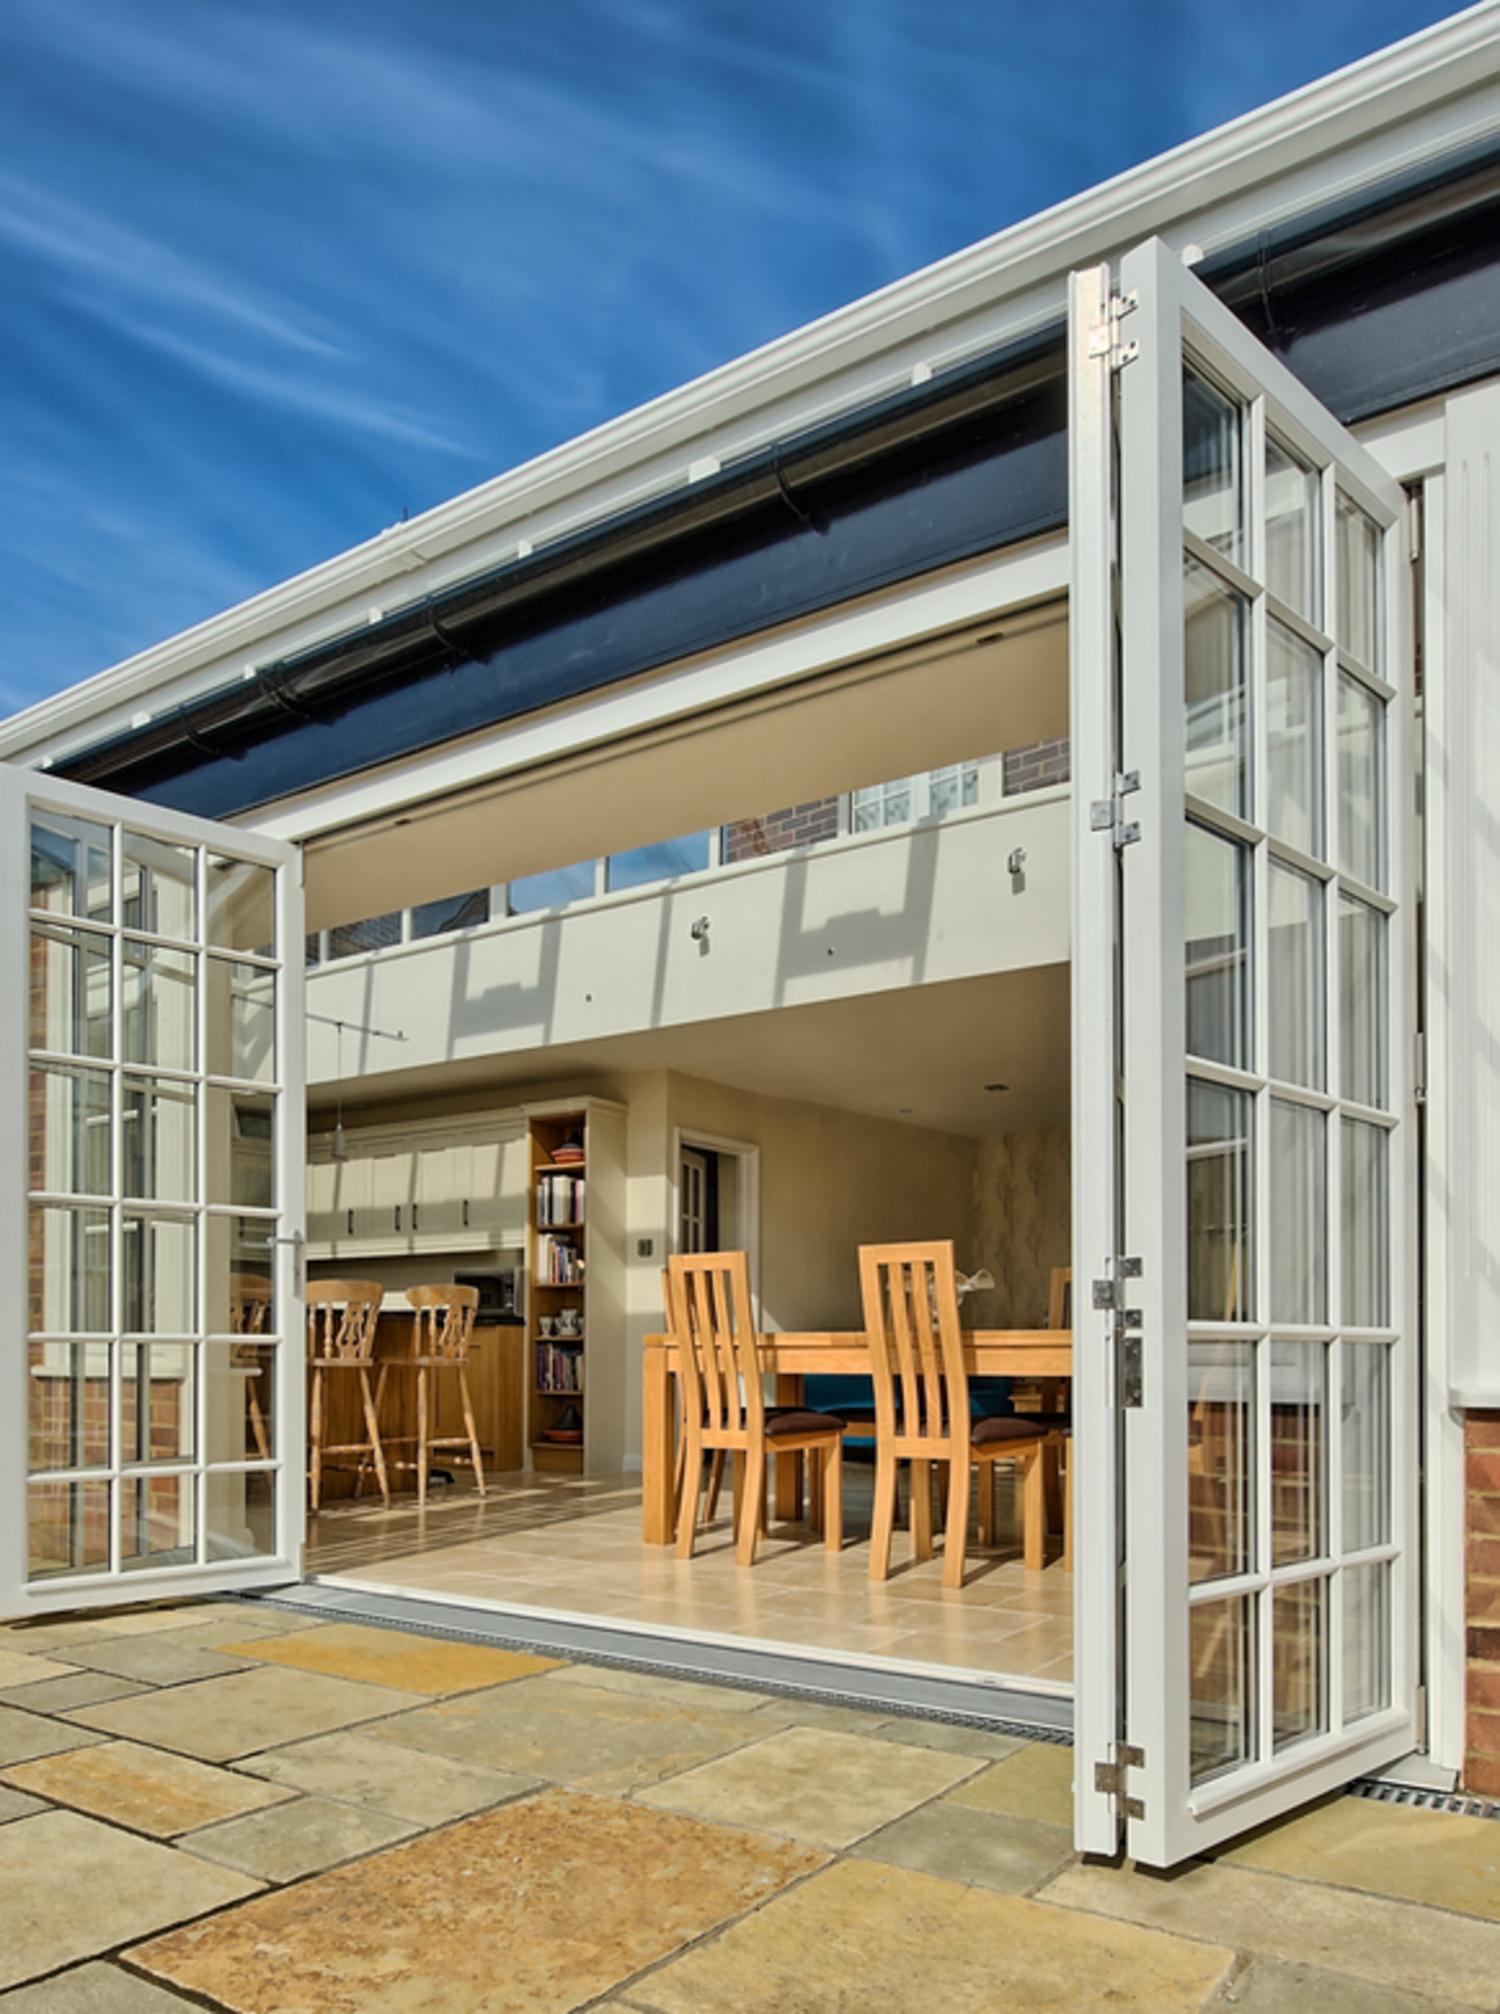 architects-st-albans-house-extension-garden-sliding-doors-harvey-norman-3326.jpg